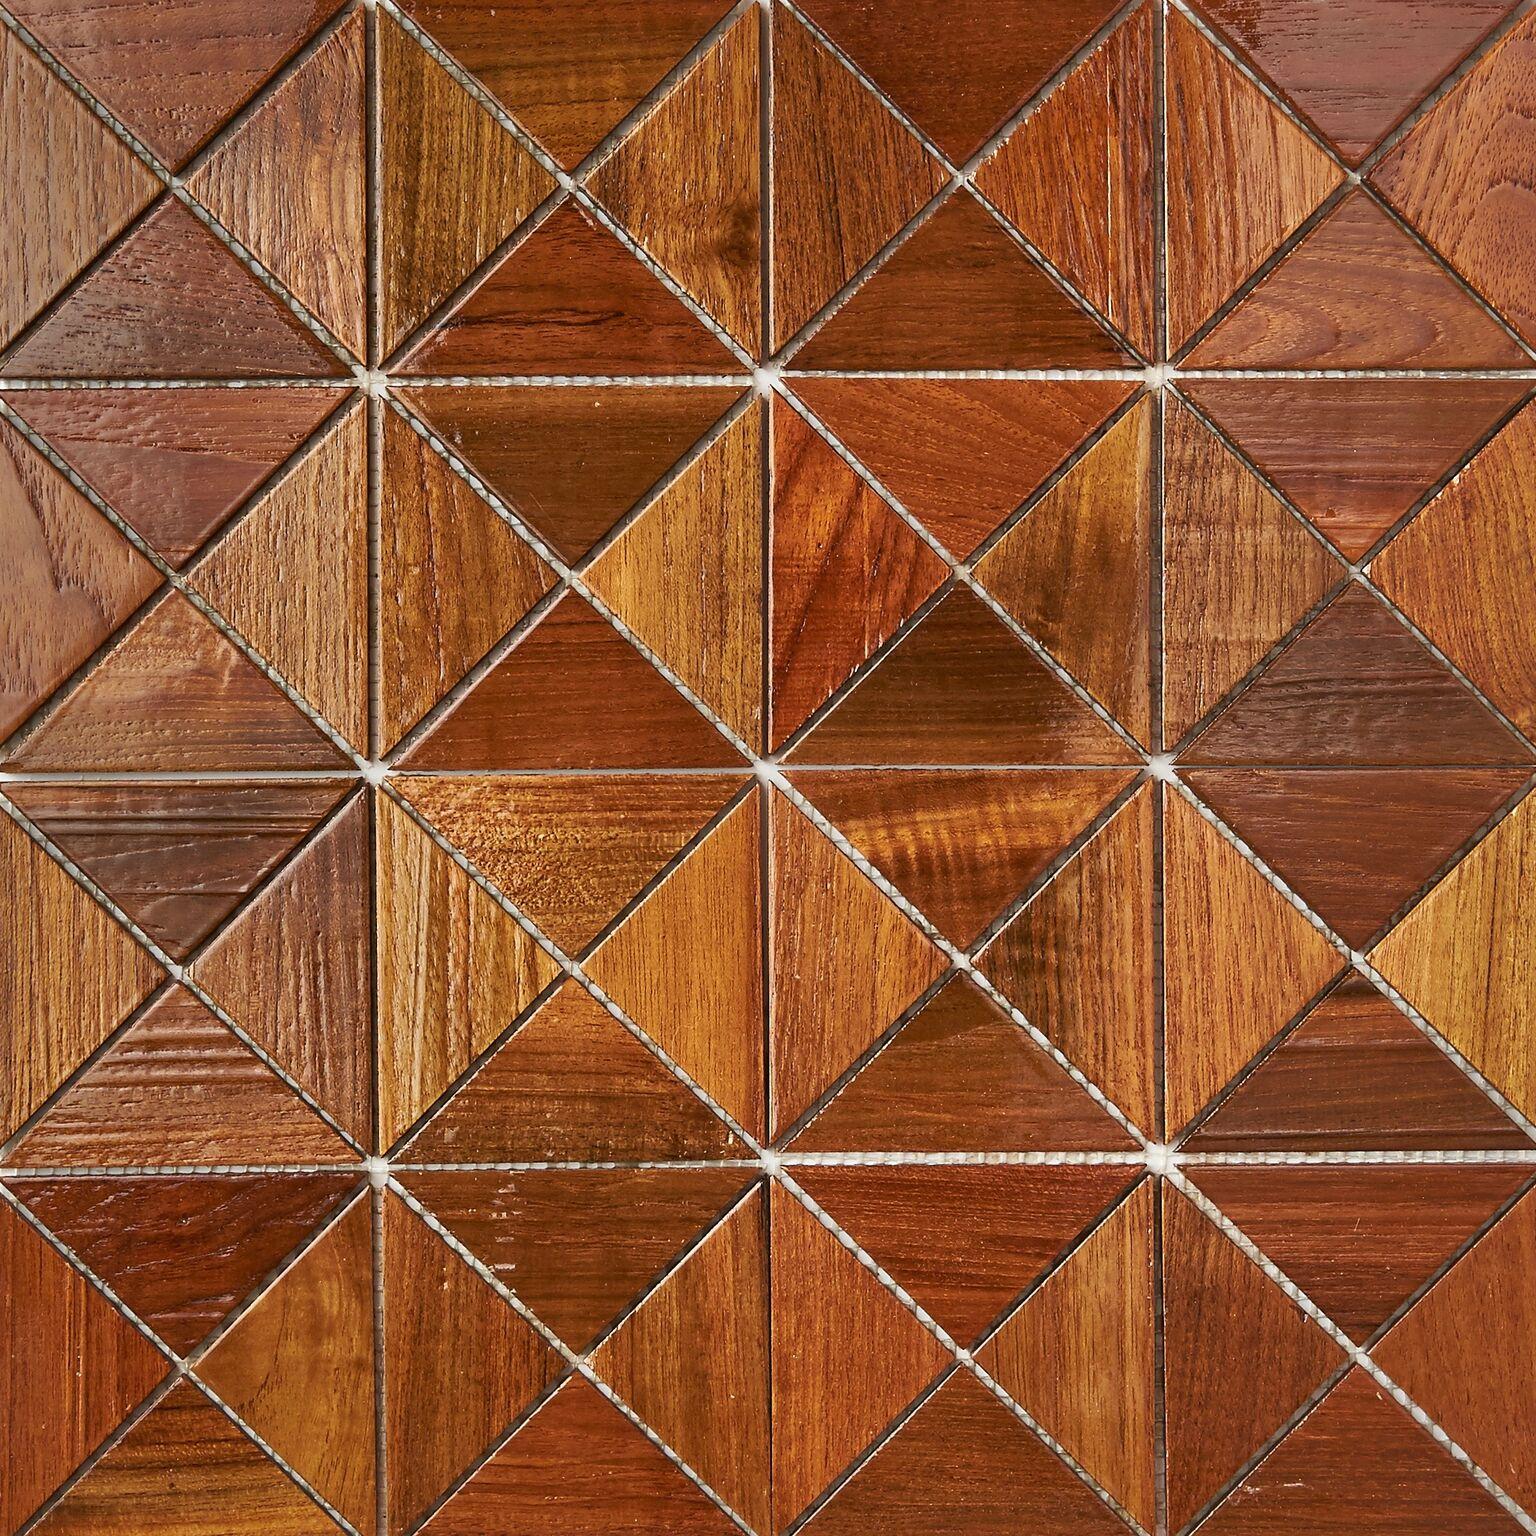 natural resin finish 8 - Teak Tile - Crosscut